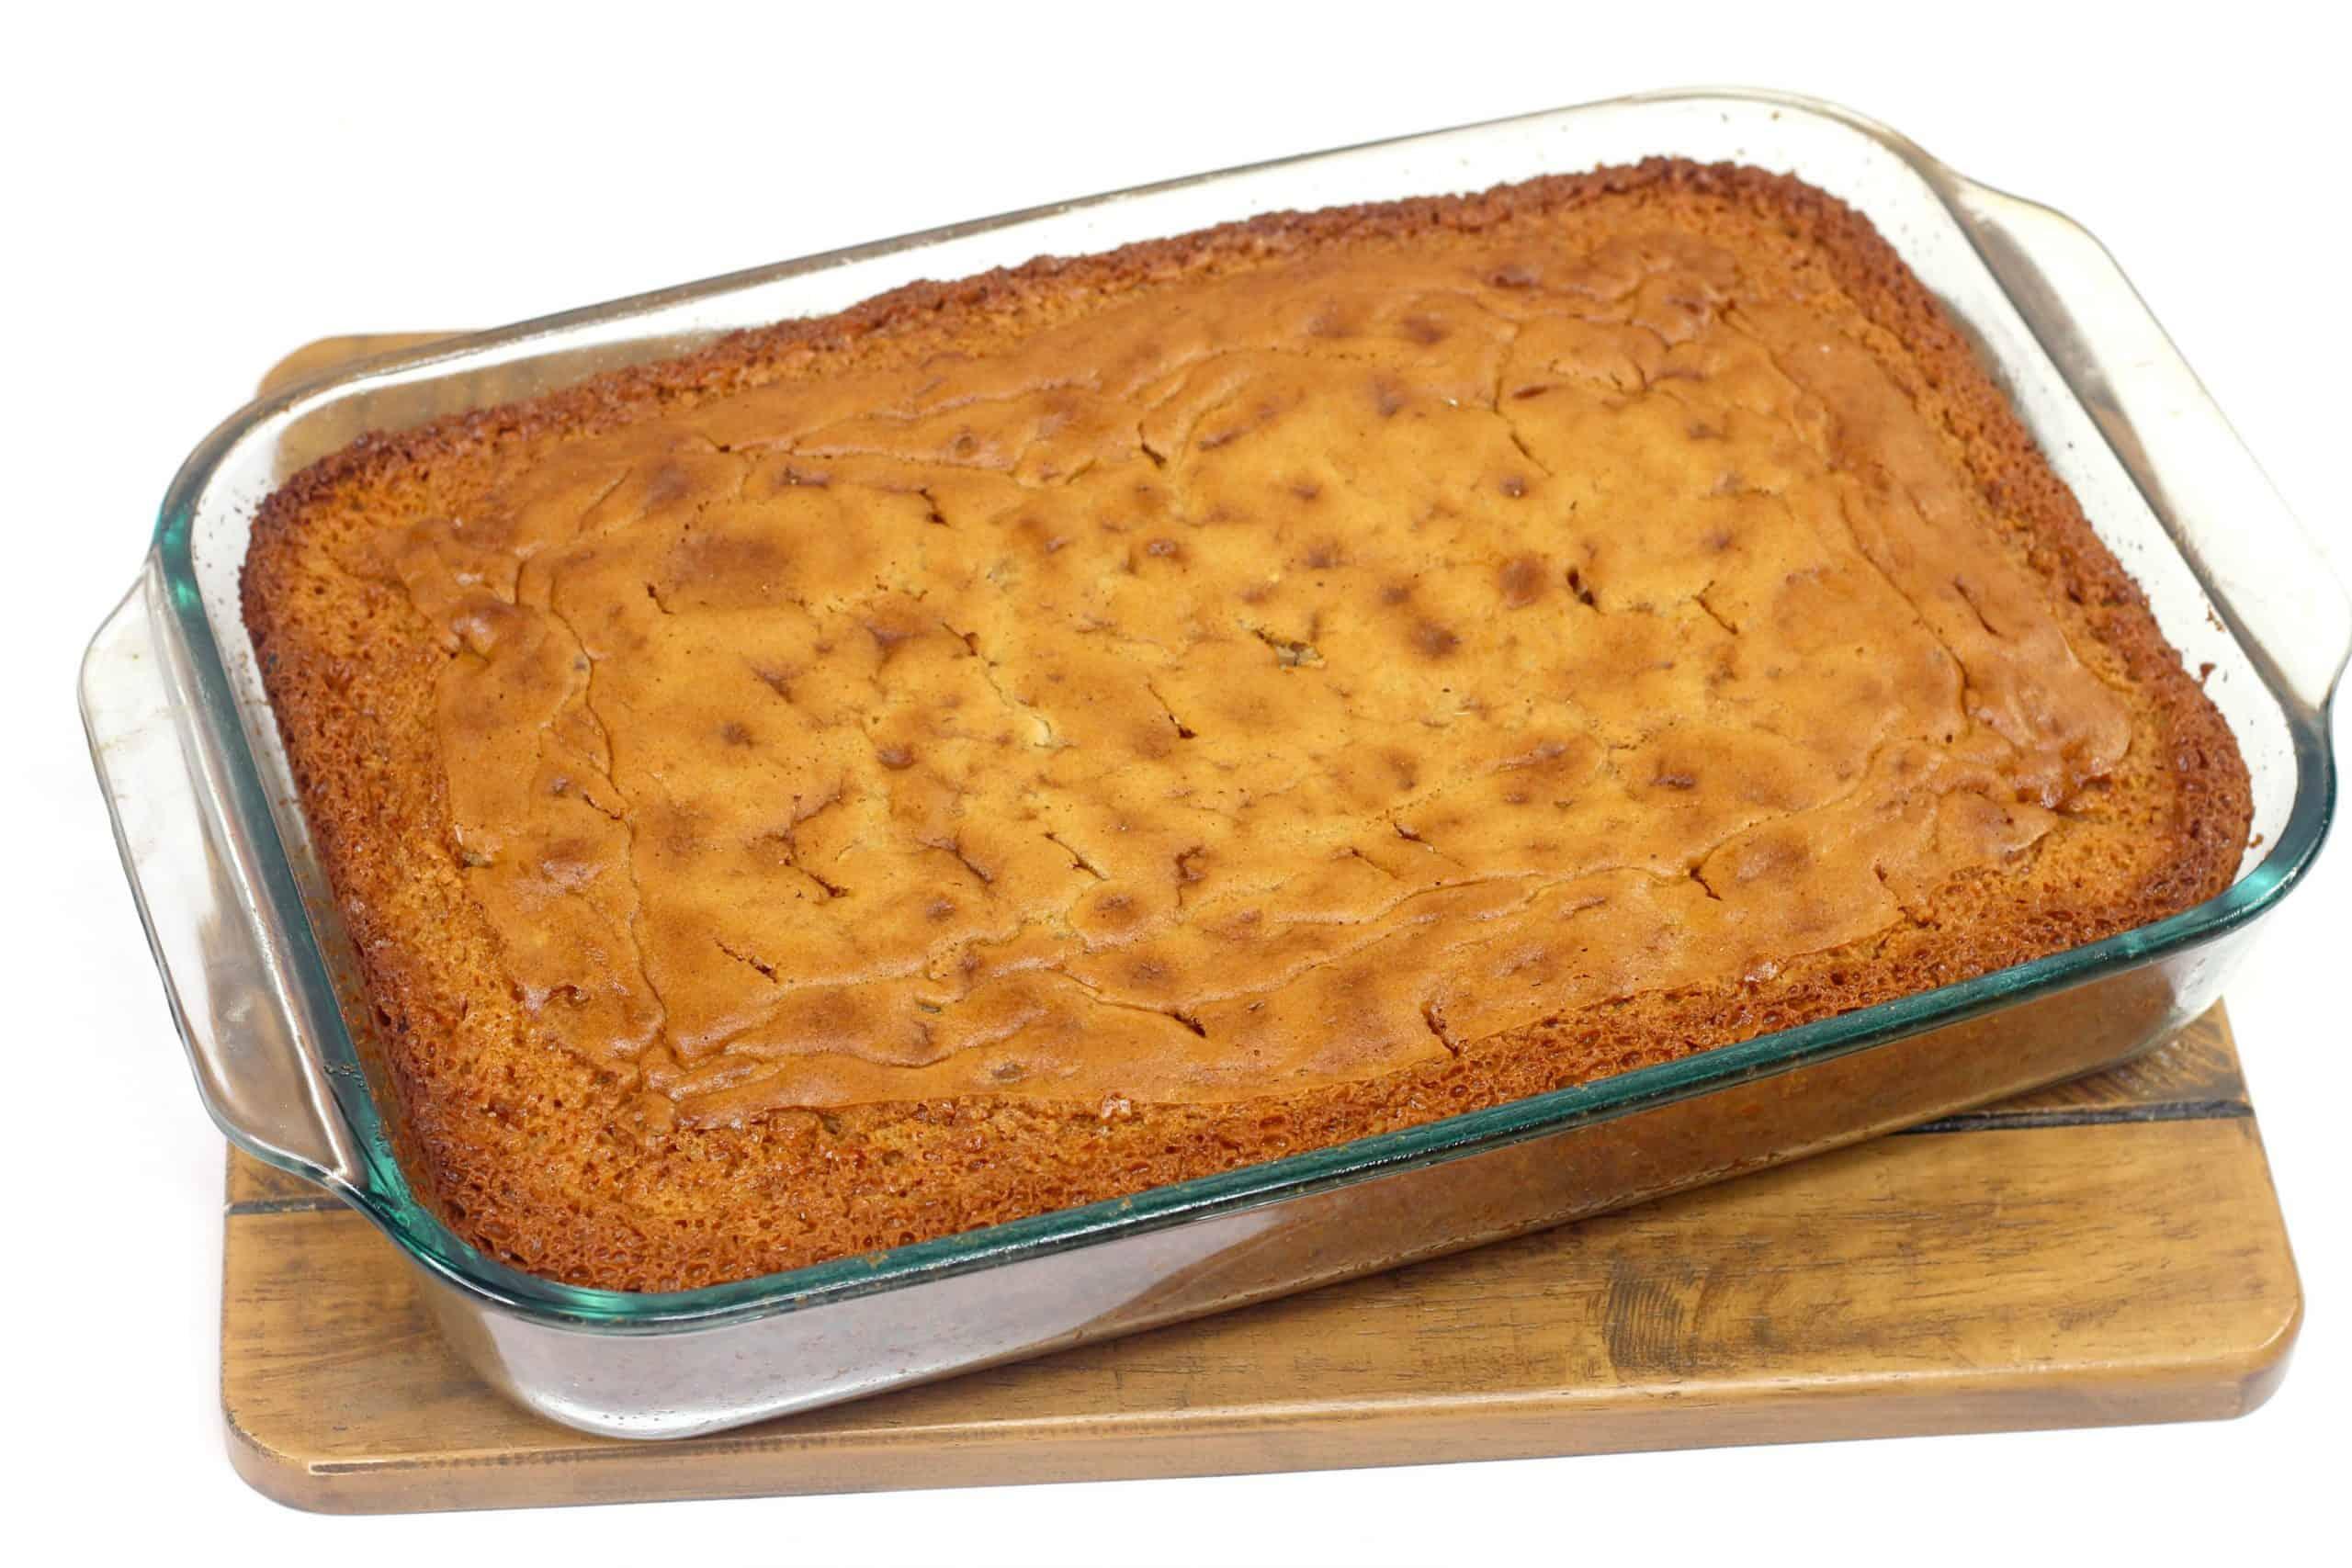 southern butter pecan cake in pan